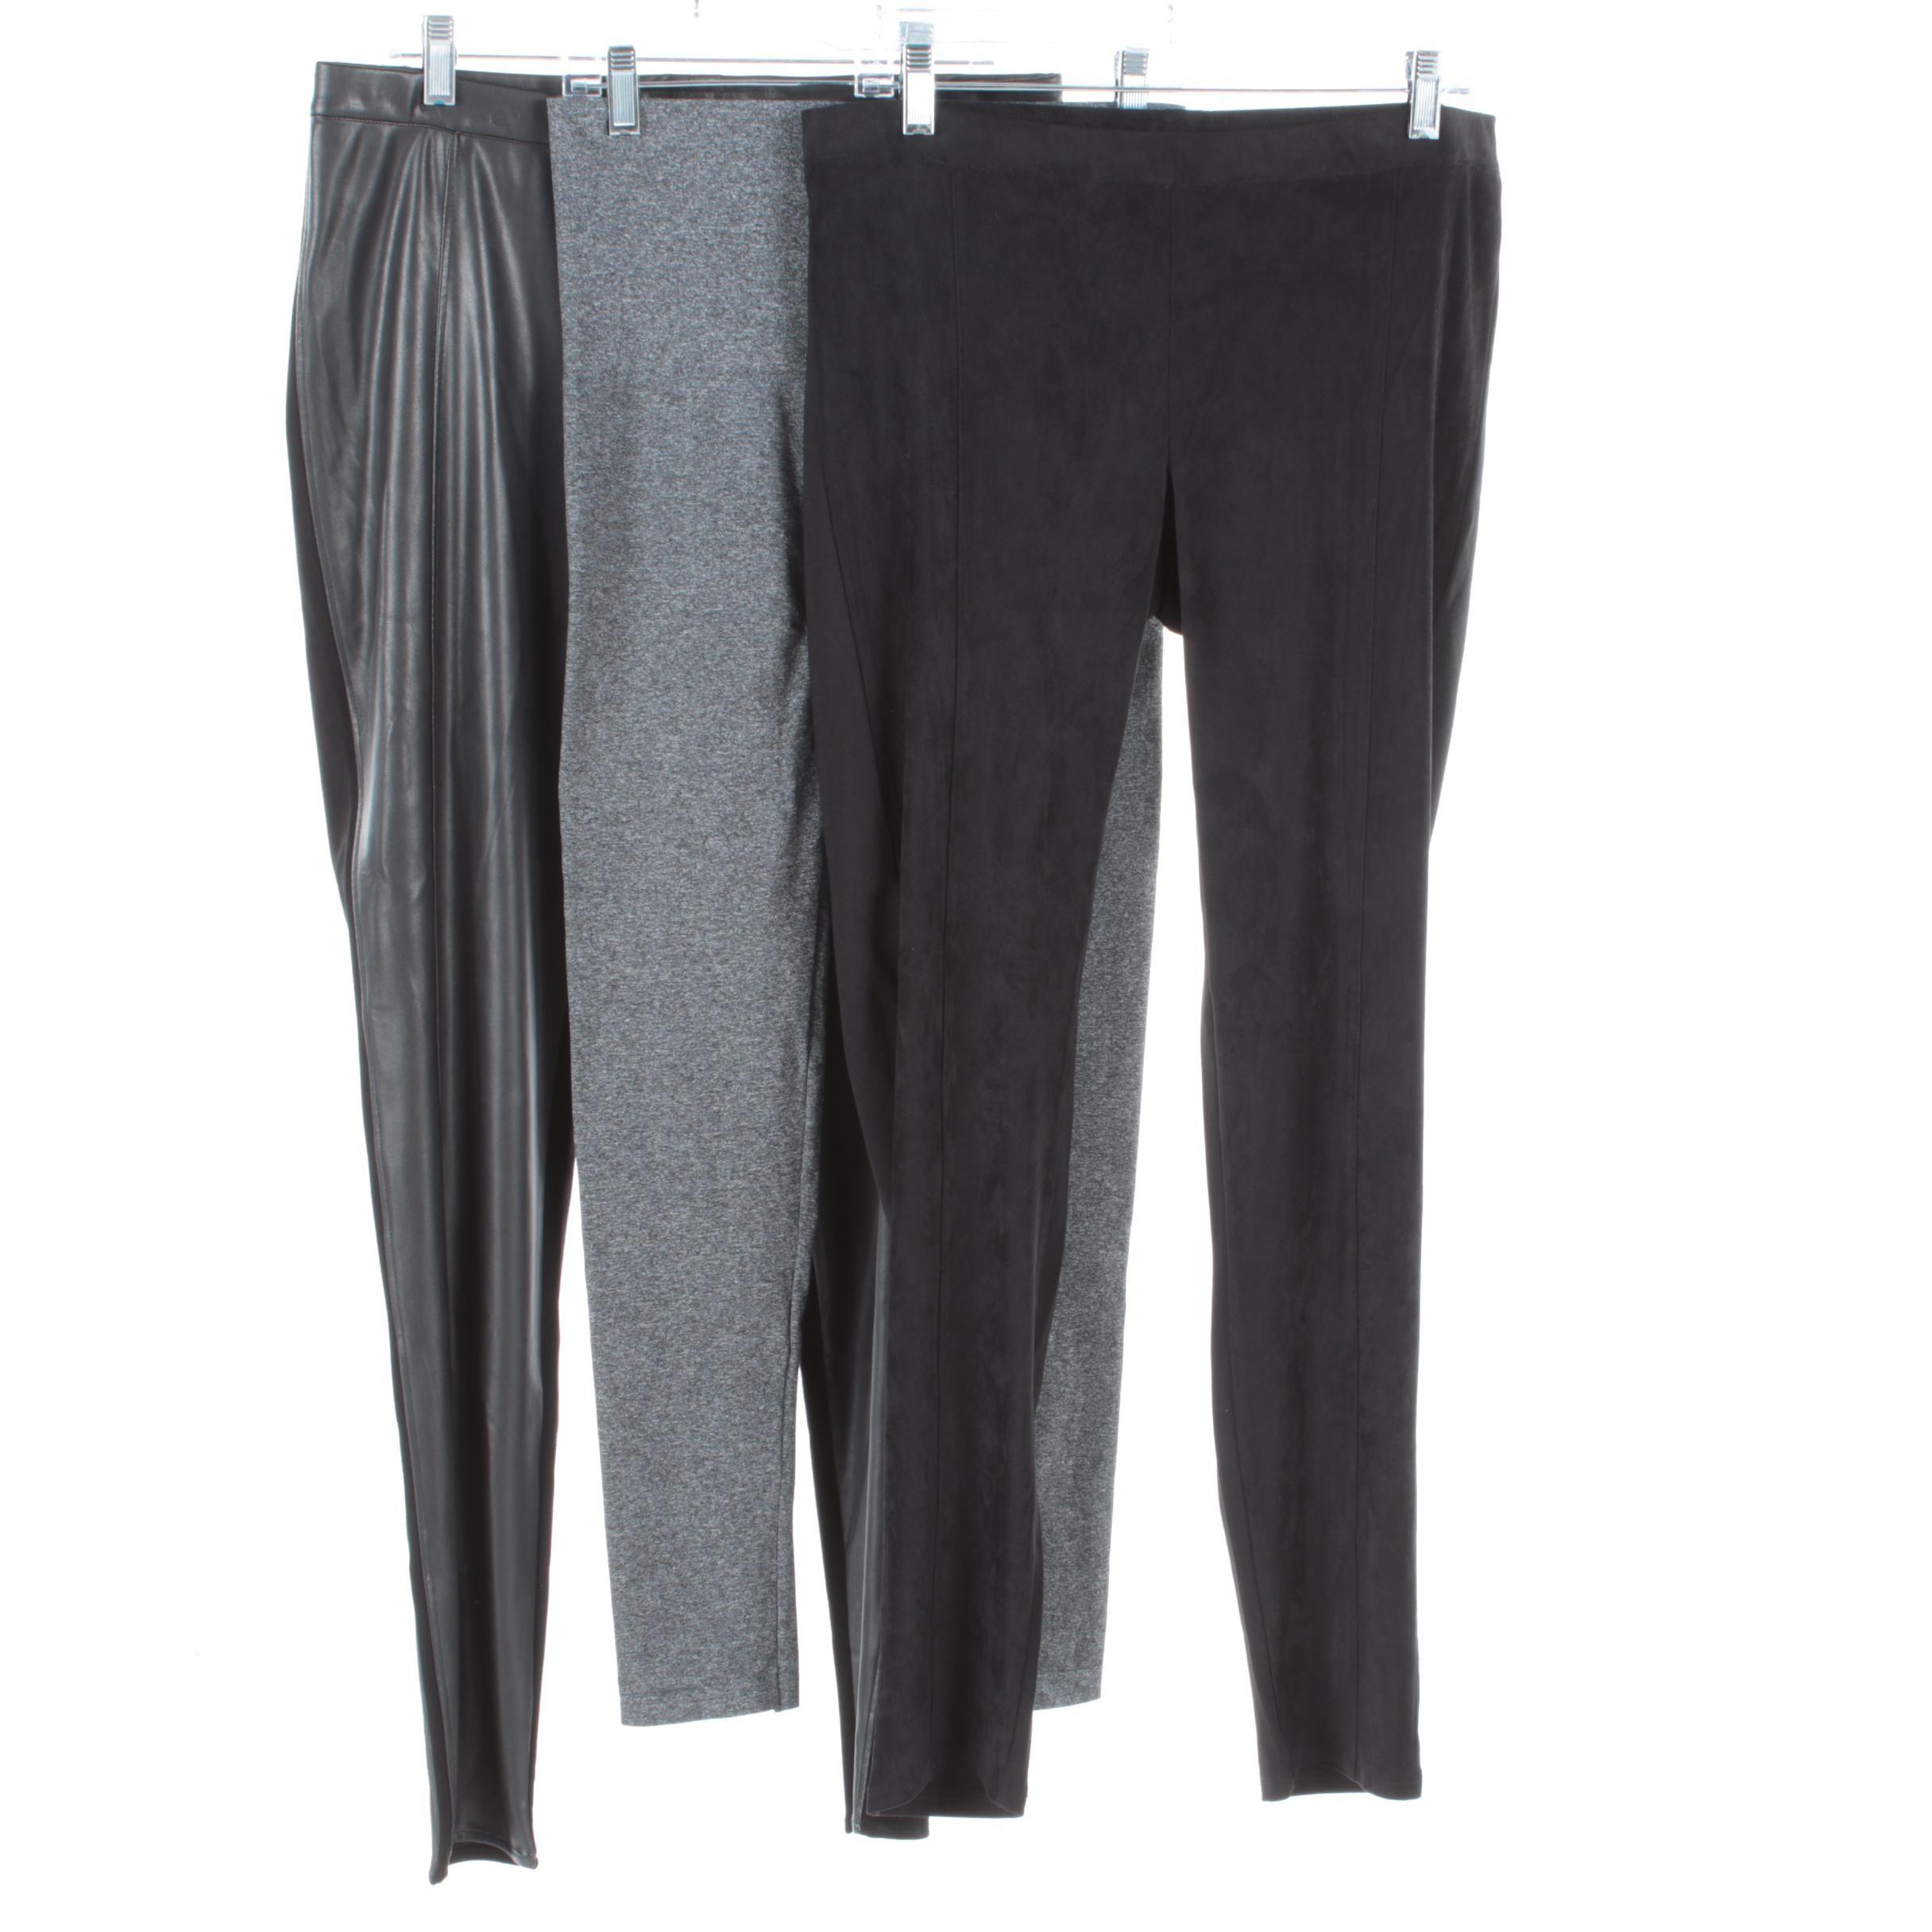 Women's Pants and Leggings Including Vegan Leather